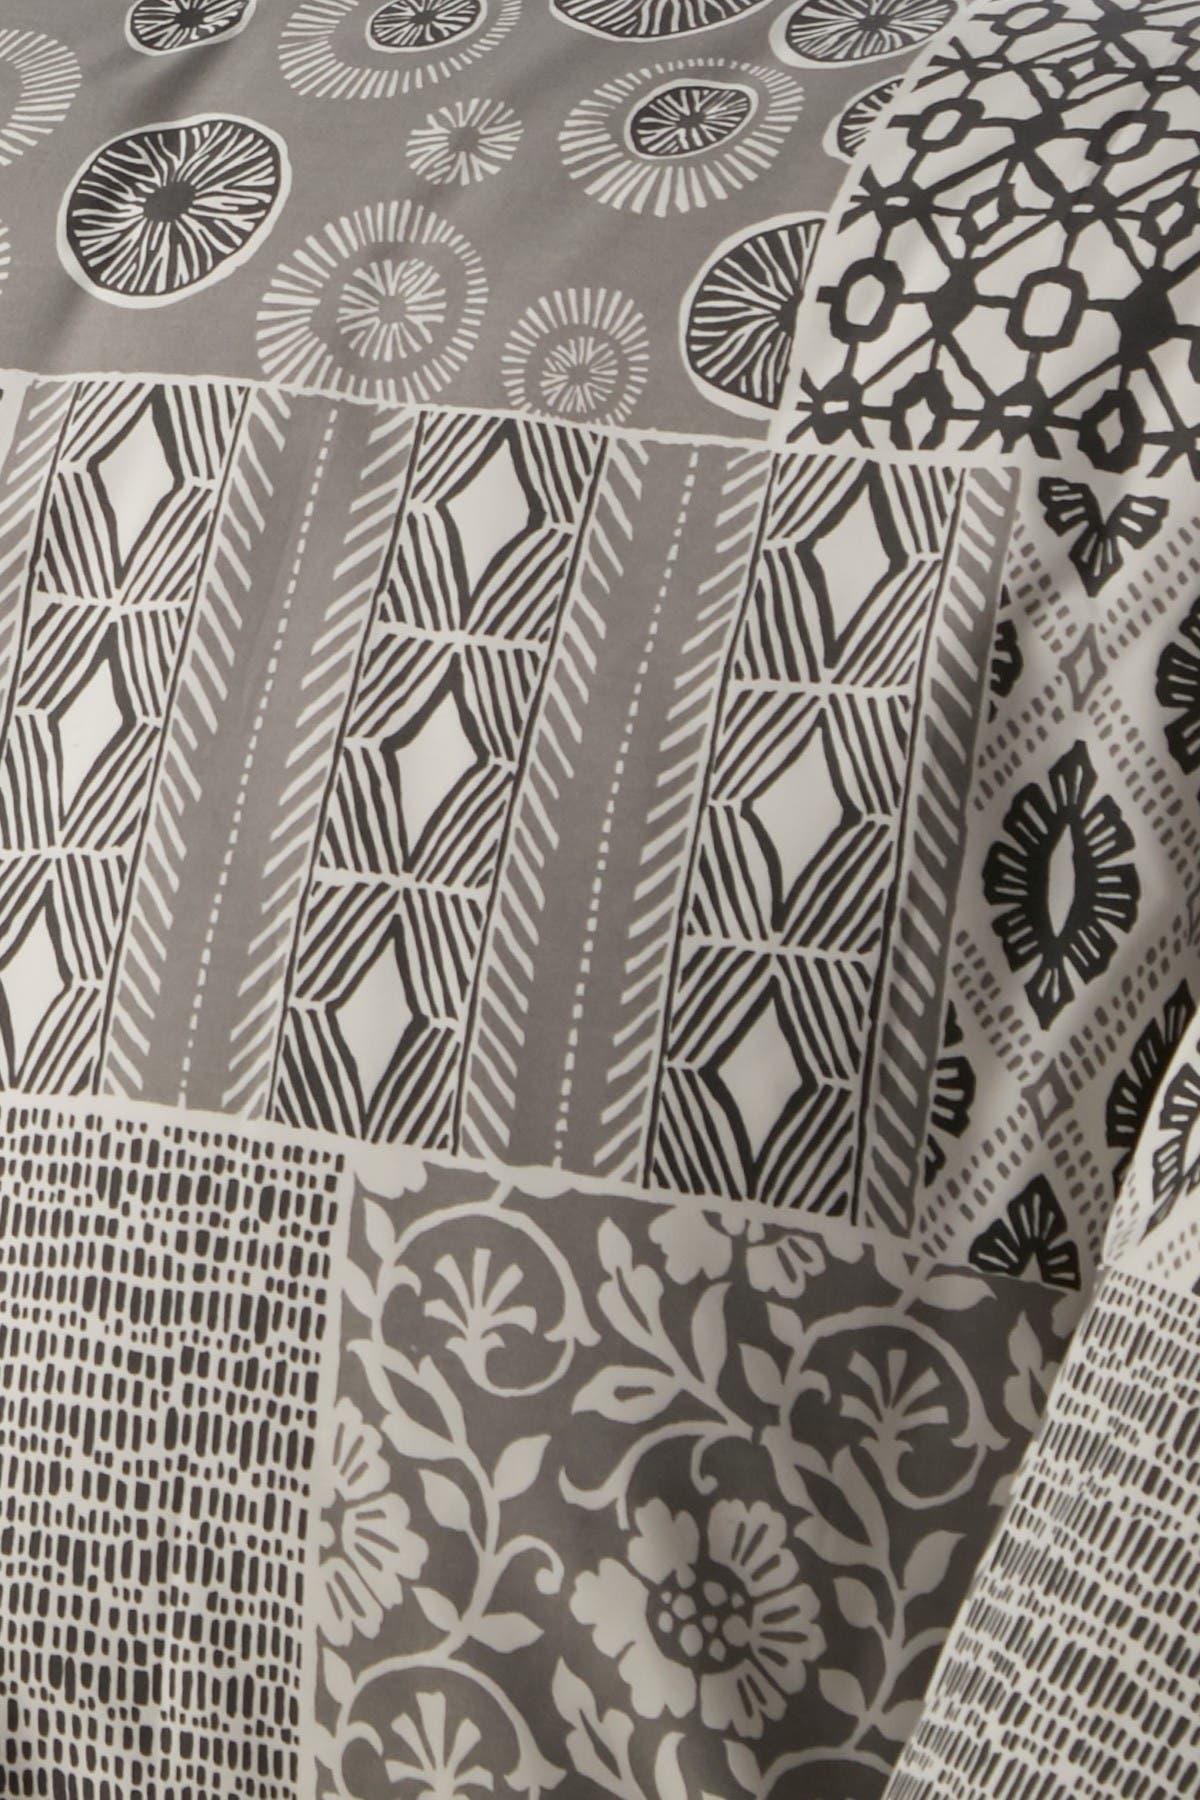 Image of SOUTHSHORE FINE LINENS Full/Queen Premium Oversized Duvet 3-Piece Set - Global Patchwork Grey